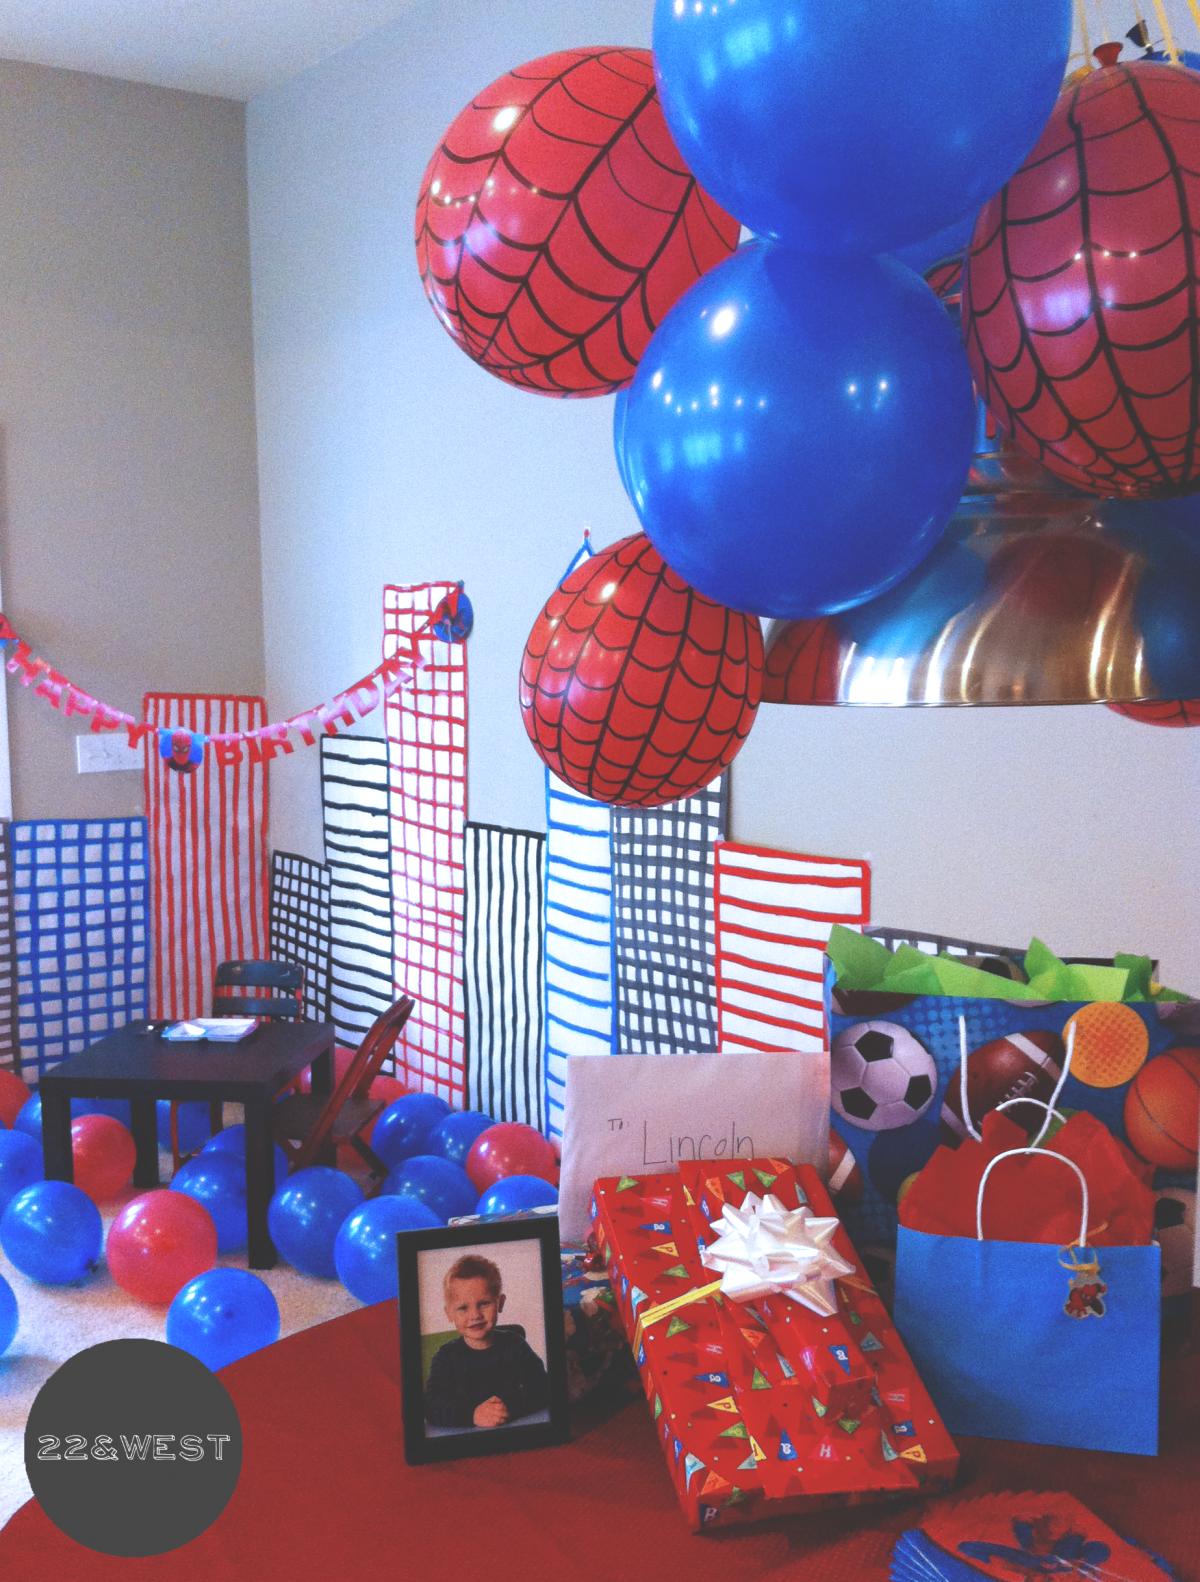 Lincoln S 4th Birthday Party Spiderman Party Superhero Birthday